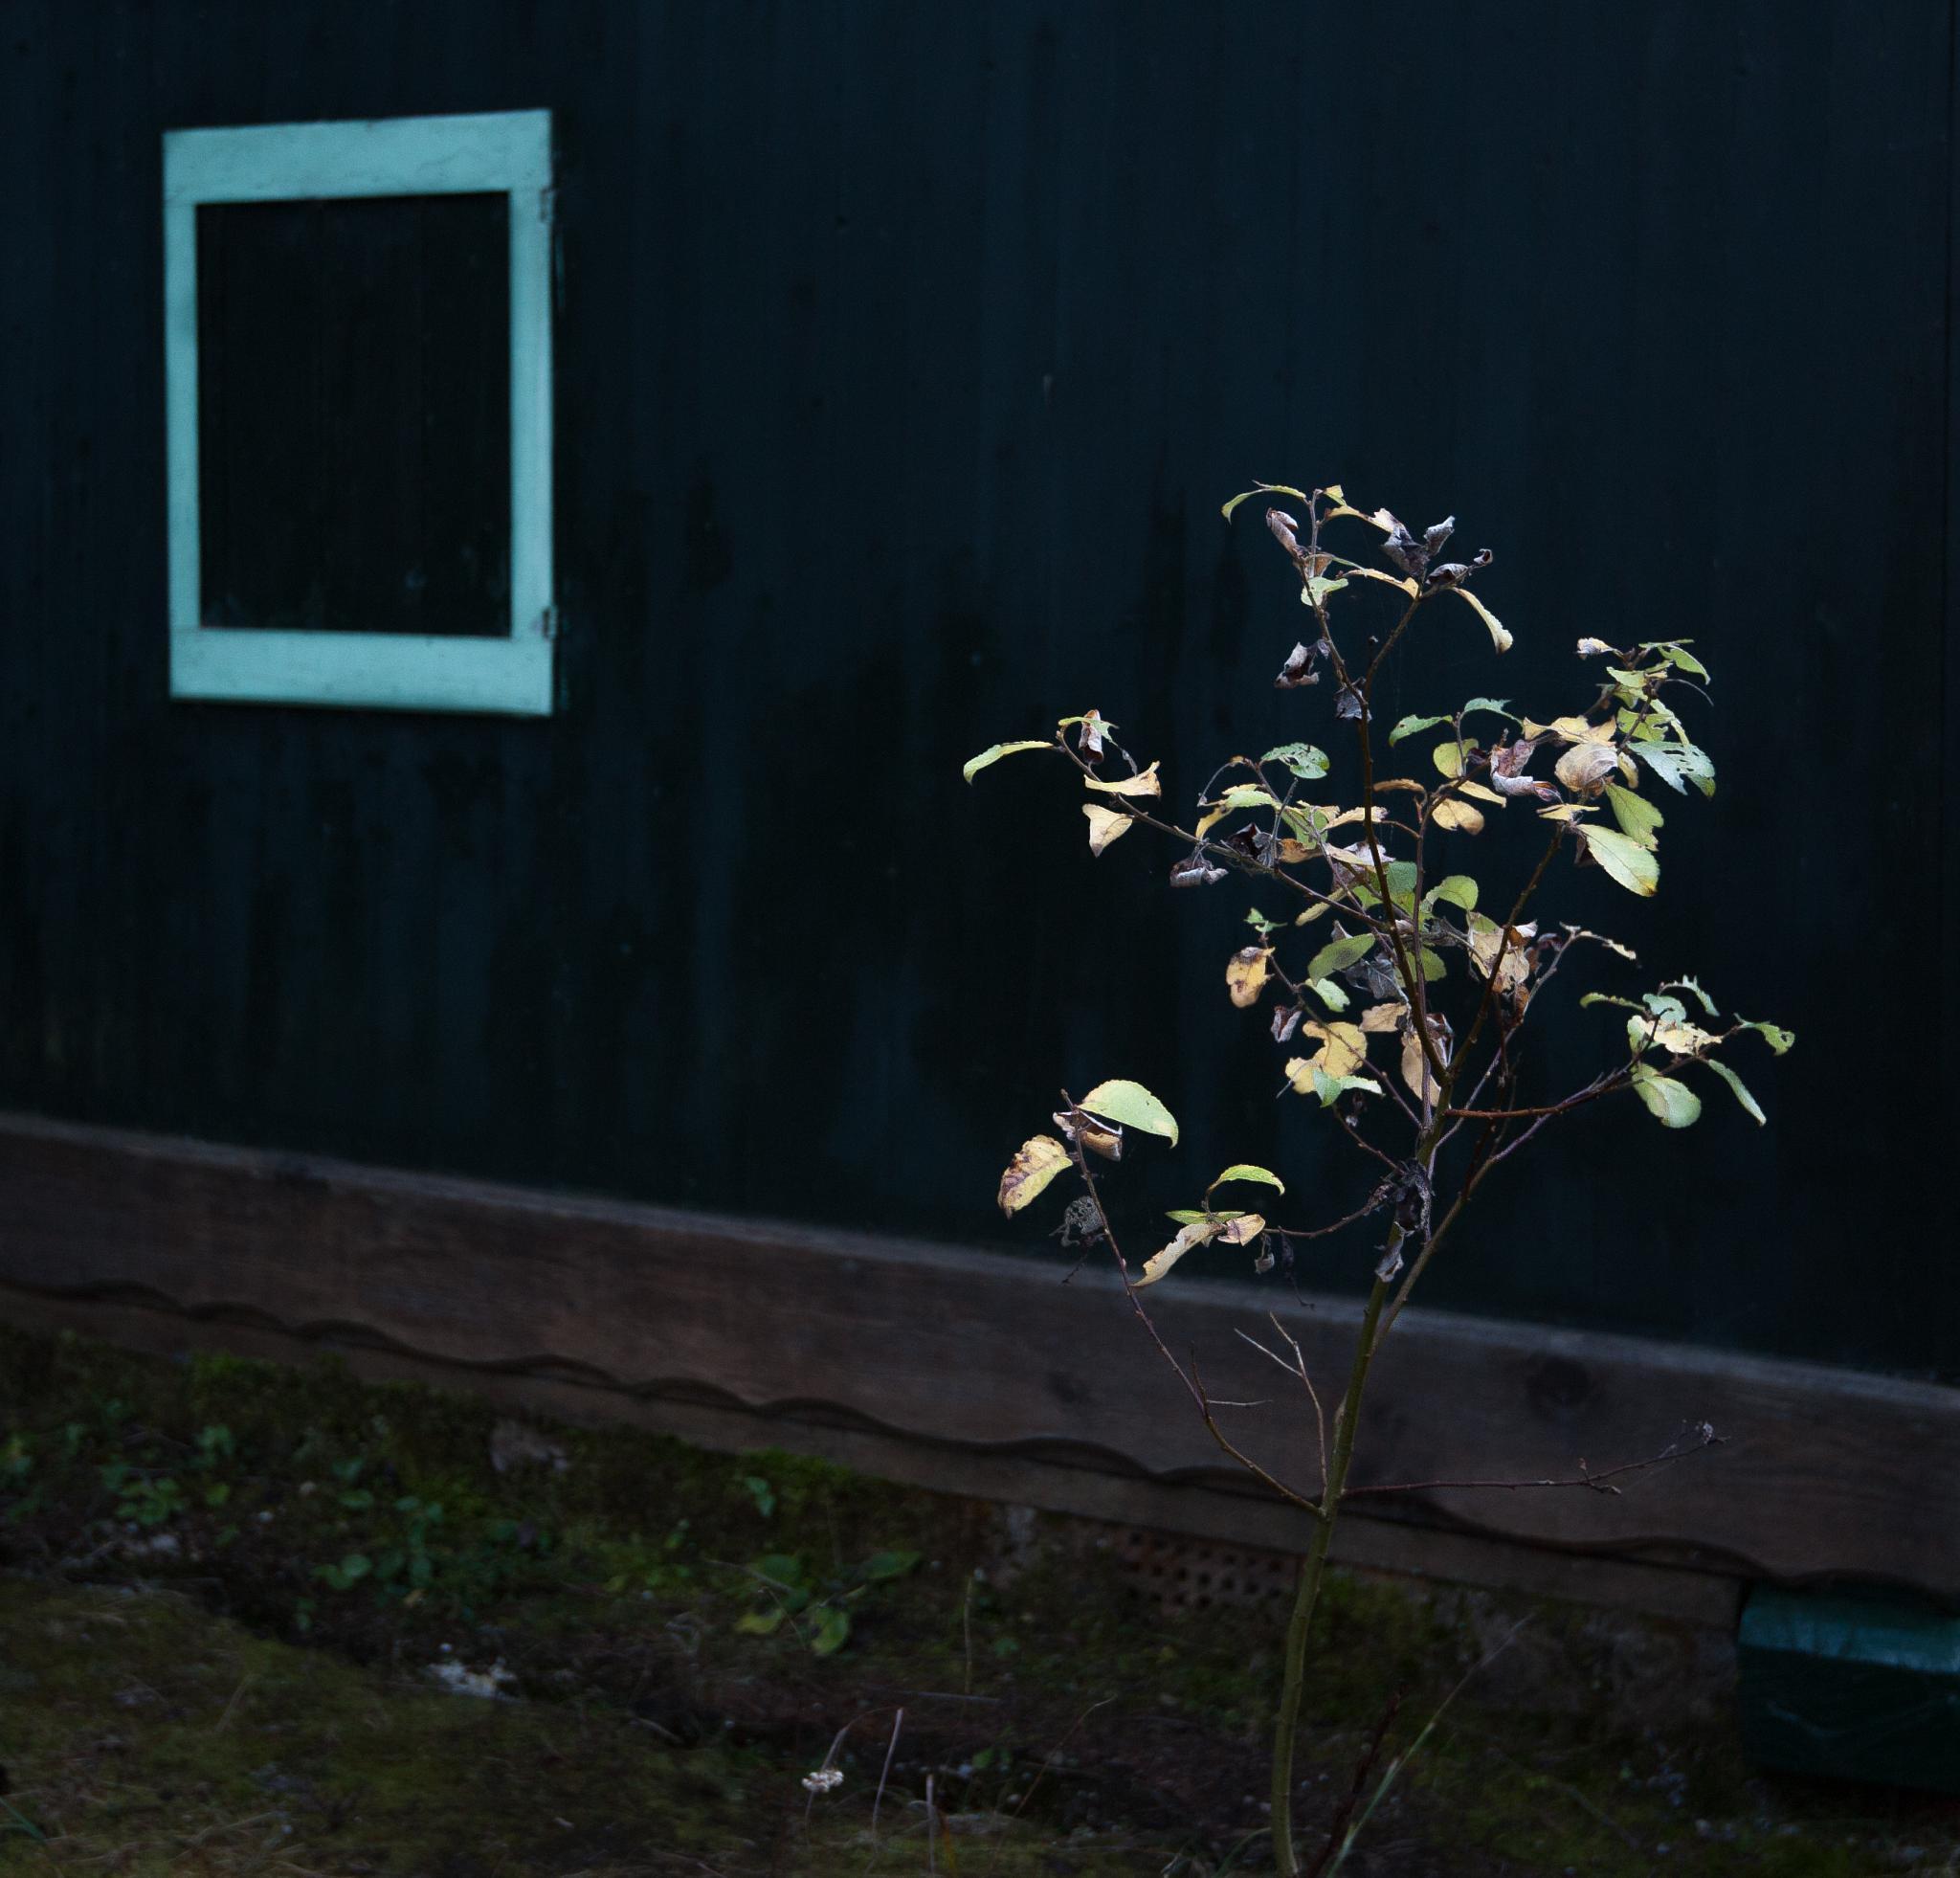 turn on the dark lights by Nicola Bortolamedi